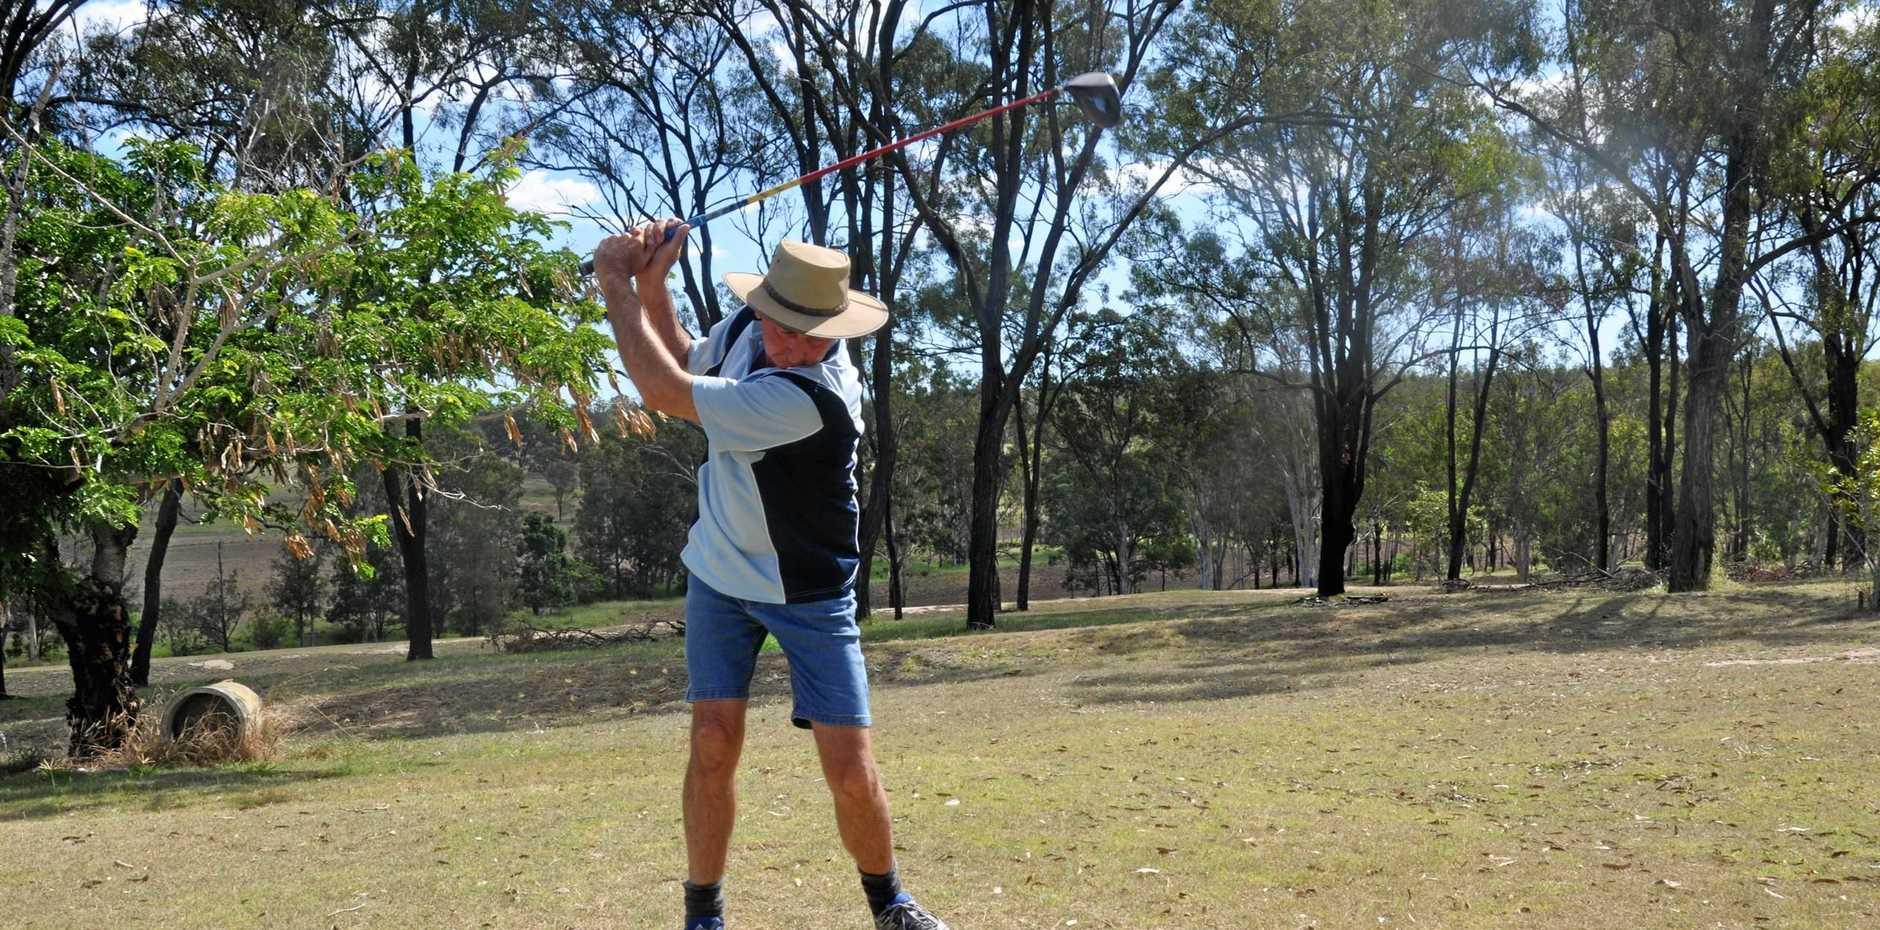 Andrew Milton at the Monto Golf Club.